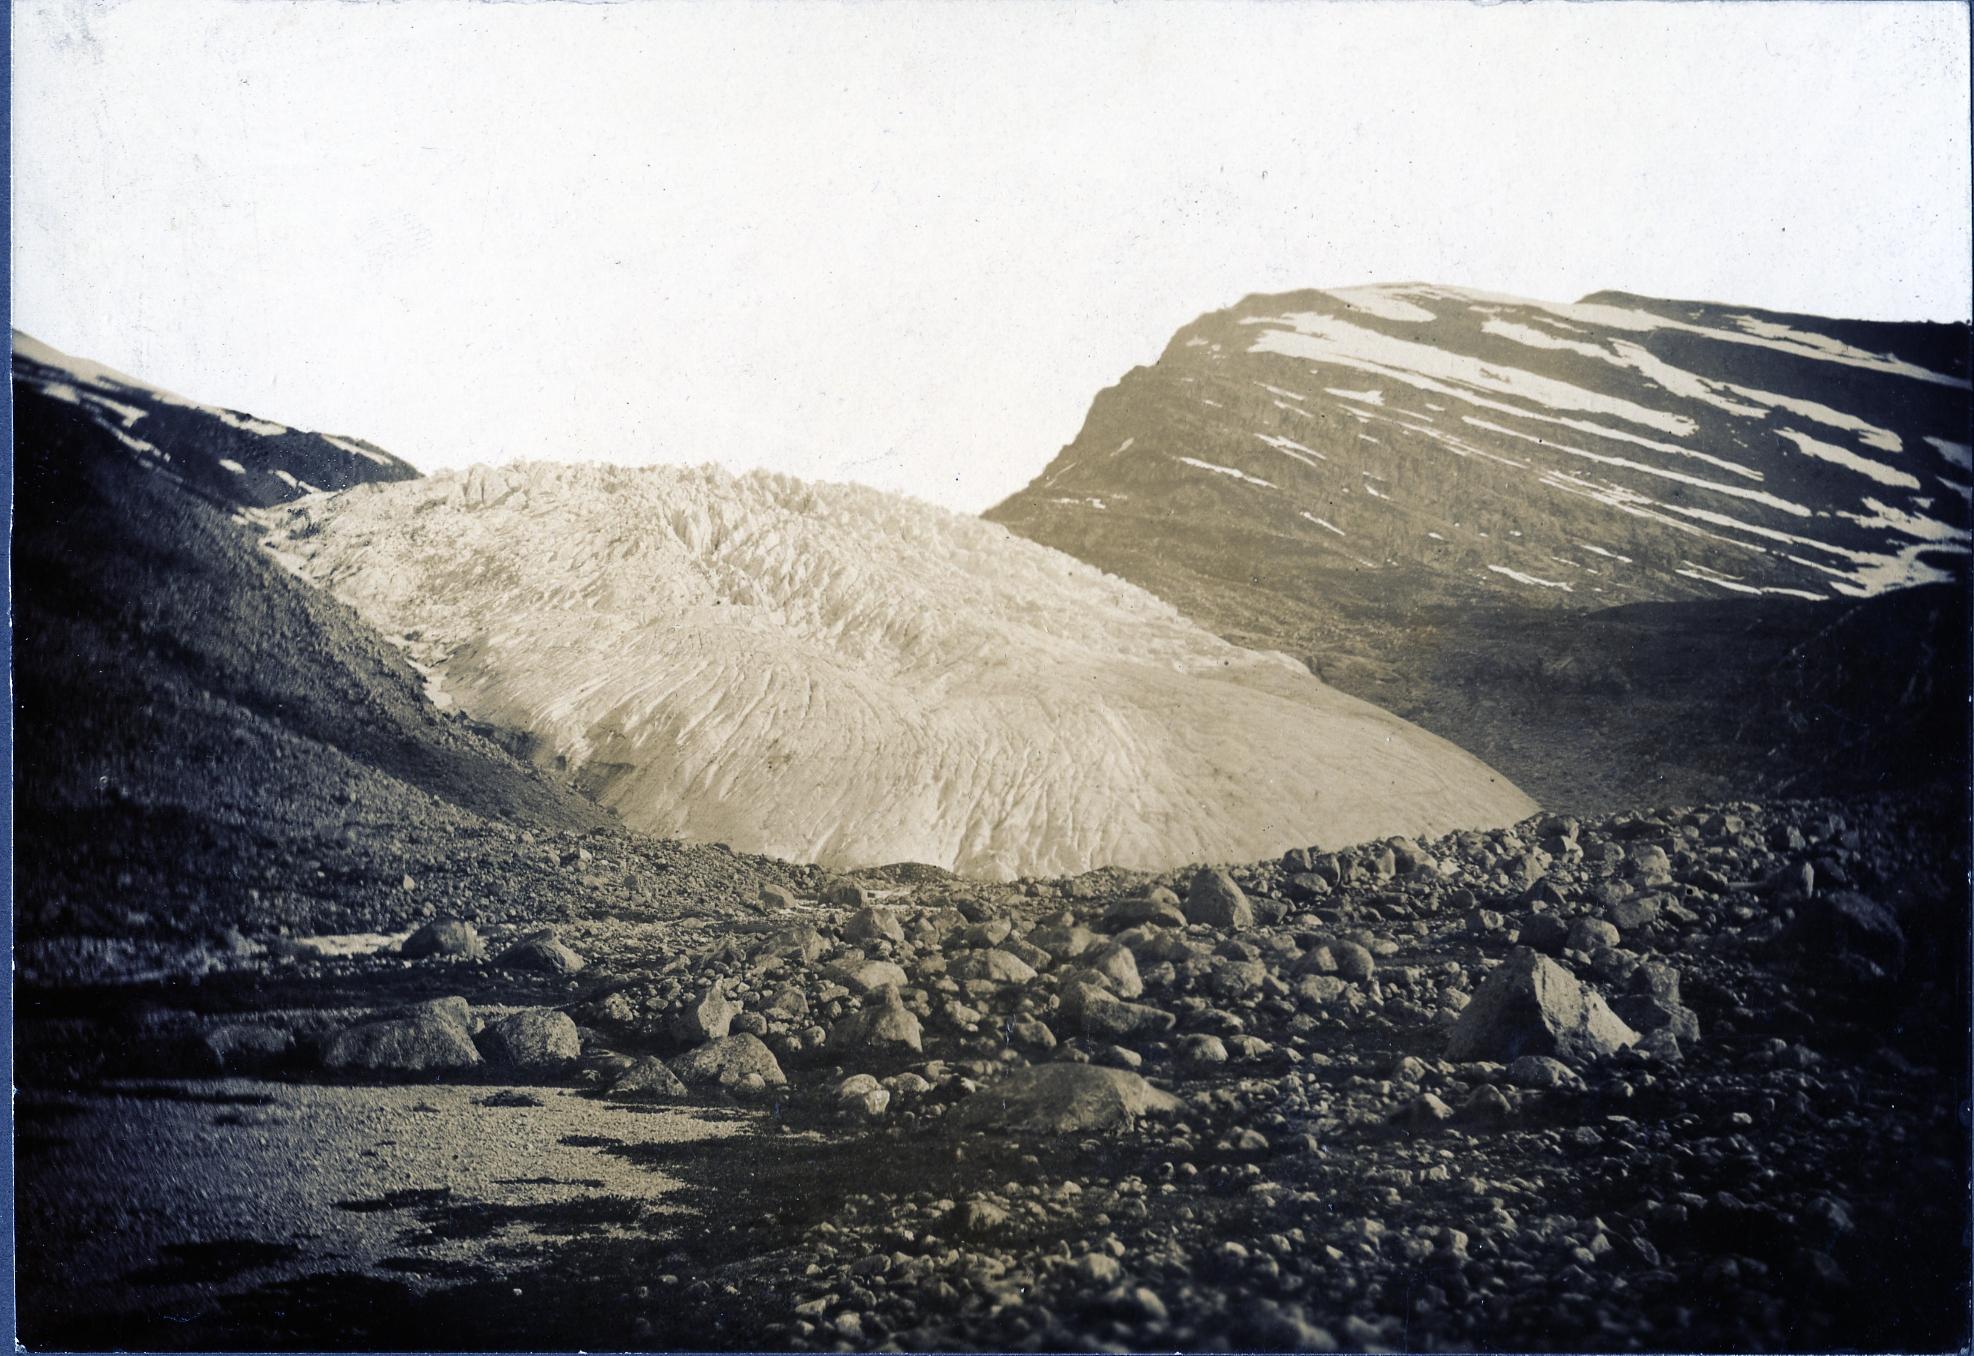 Haugabreen Glacier in the 1930s